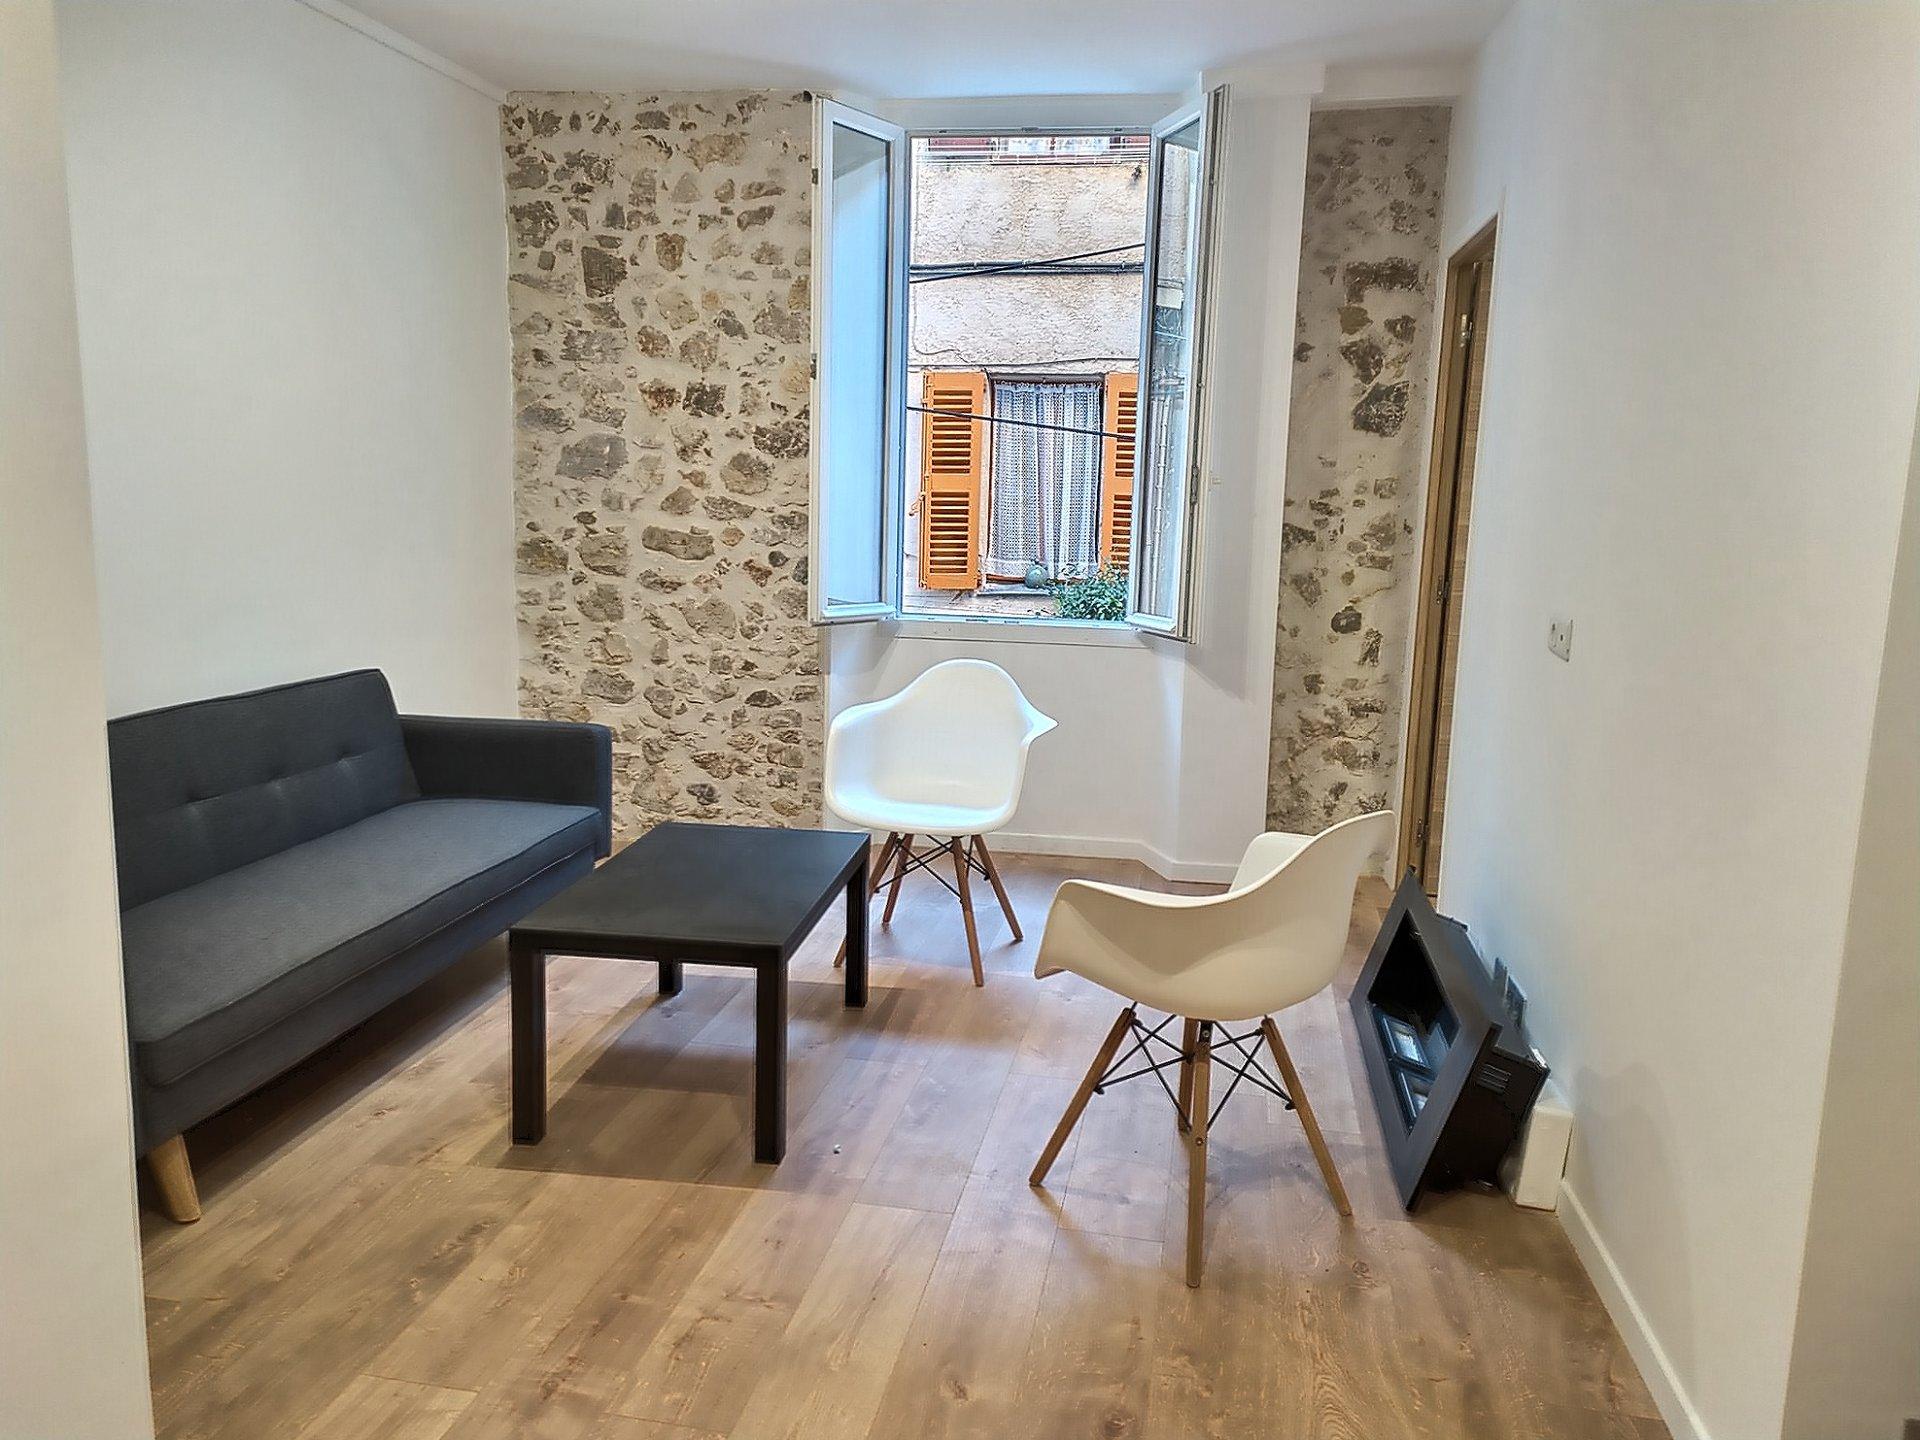 ANTIBES VIEILLE VILLE - 2 pièces 34.43 m²